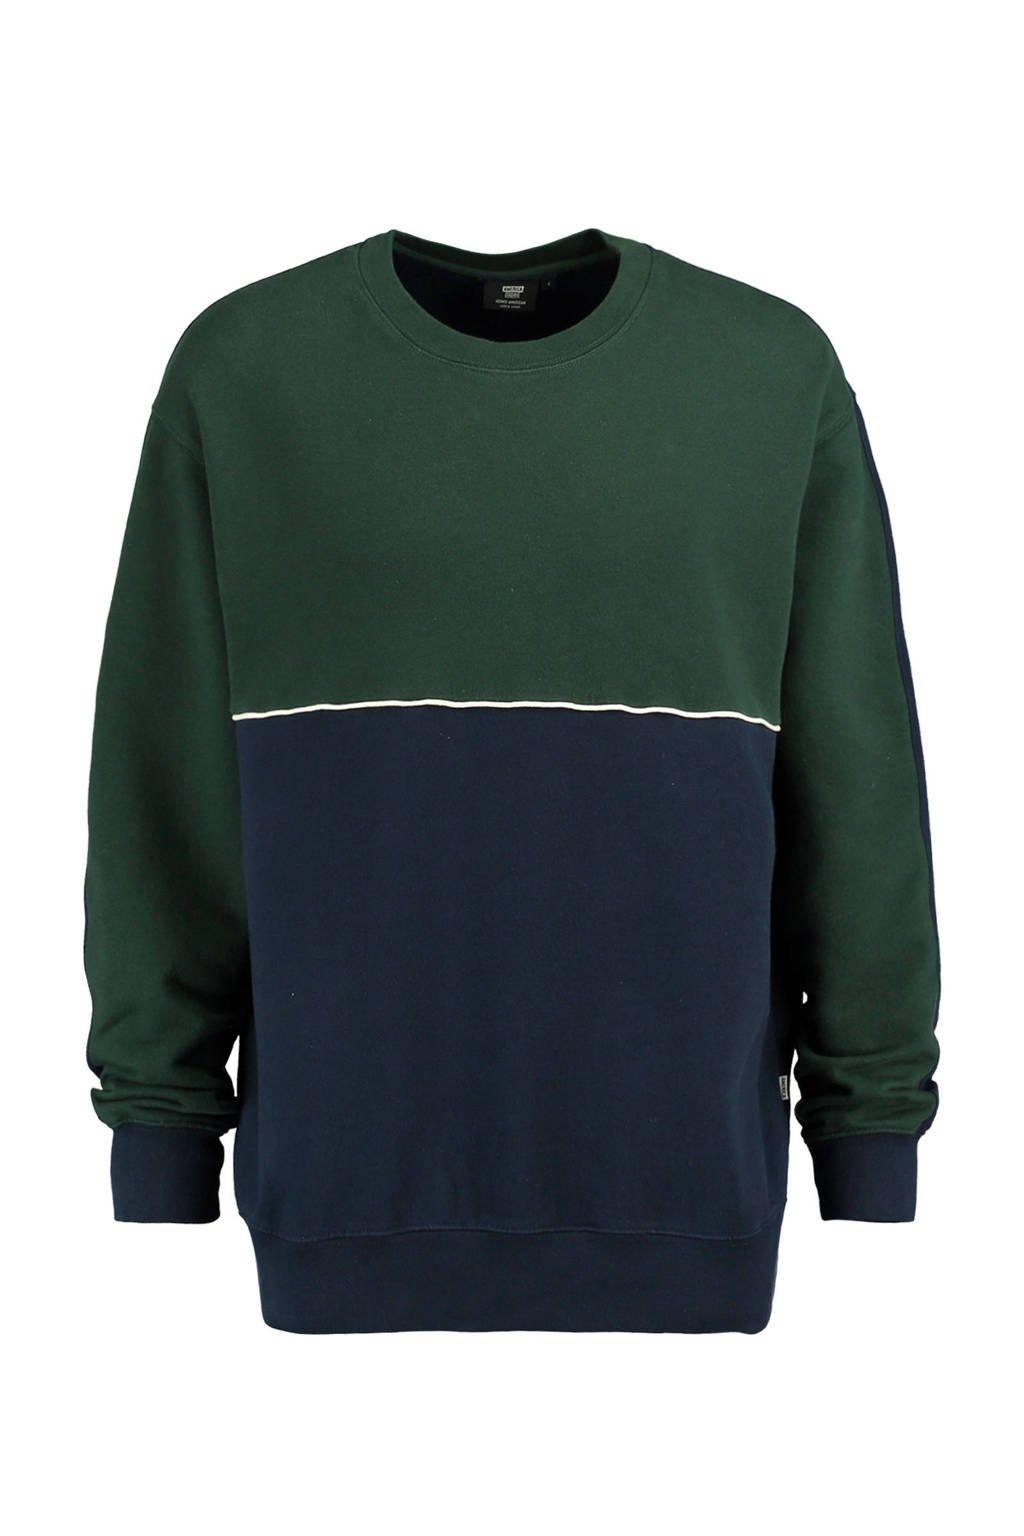 America Today sweater donkergroen, Donkergroen/marine